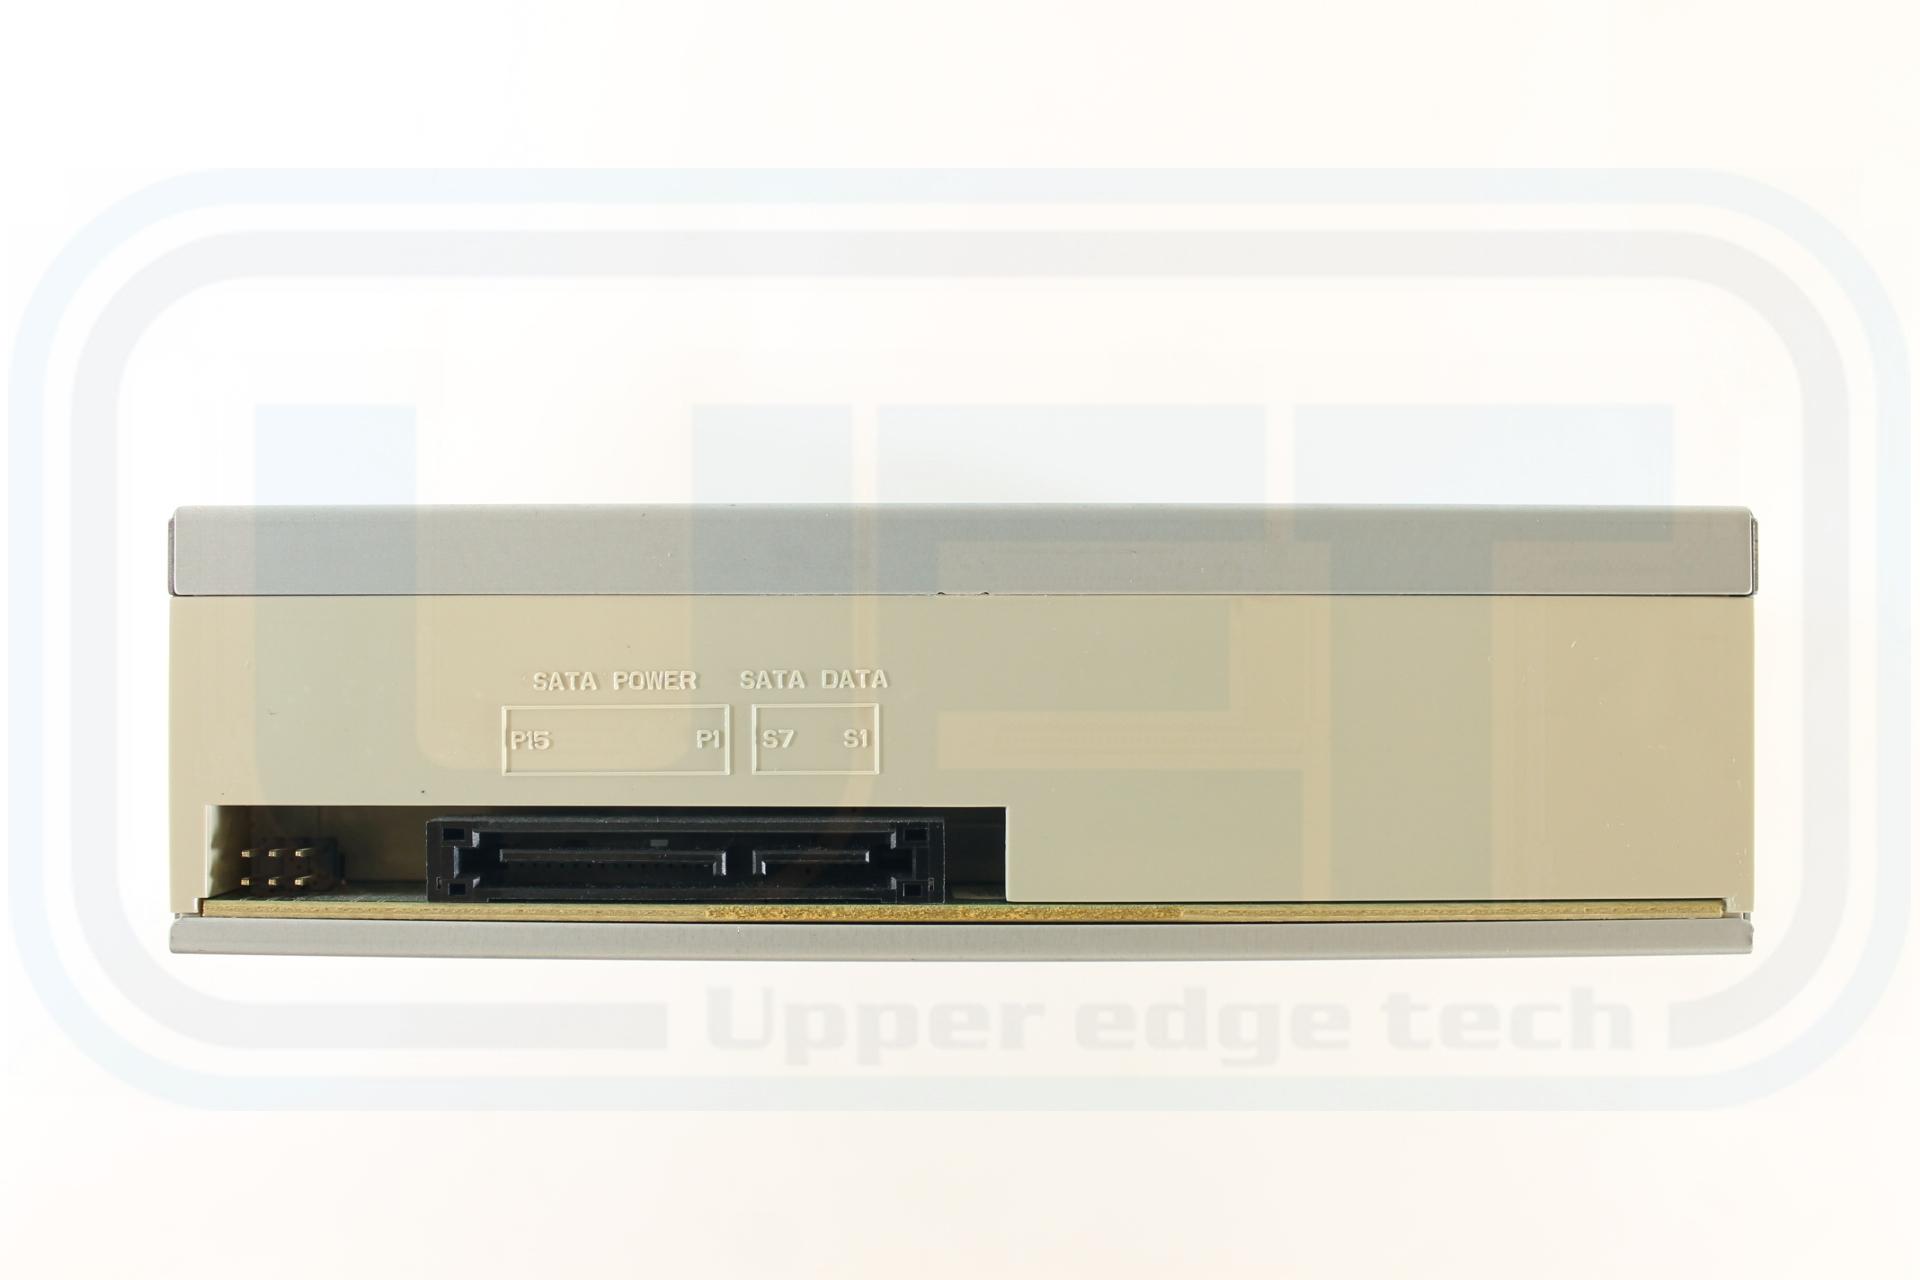 DELL XPS 710 SONY AW-Q160S WINDOWS VISTA DRIVER DOWNLOAD